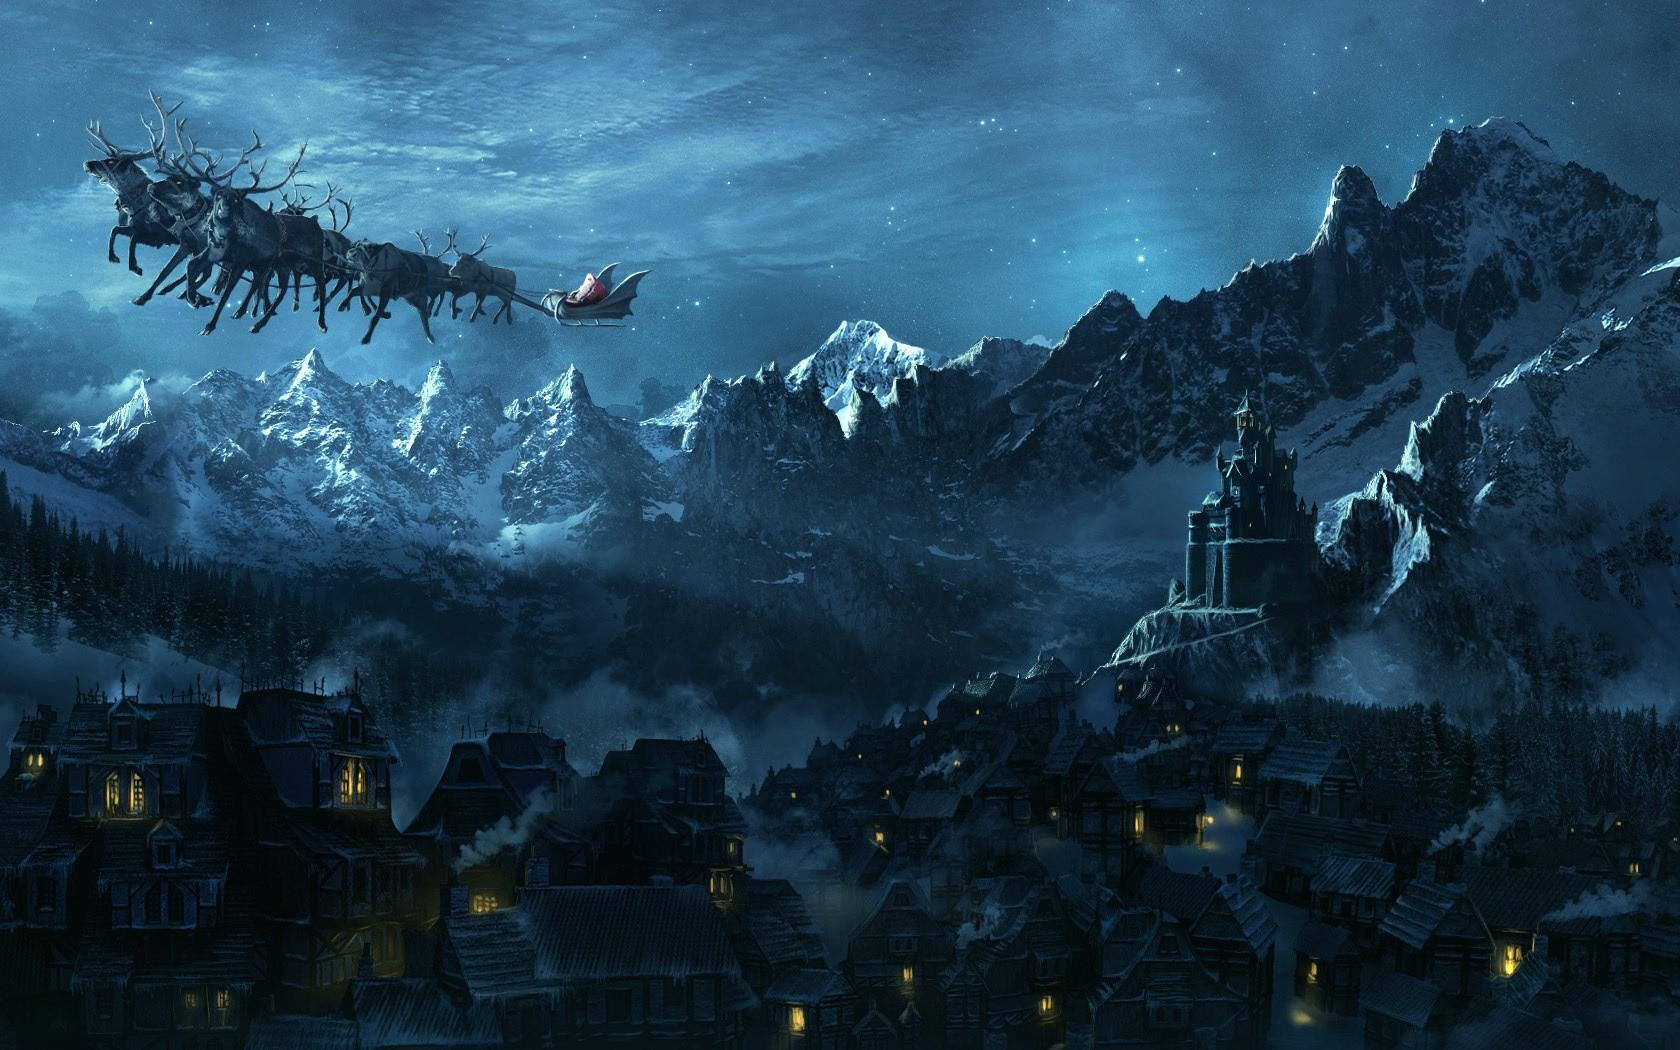 Must see Wallpaper Night Ghost - landscape-fantasy-art-night-village-castle-Christmas-Santa-Claus-midnight-ghost-ship-darkness-screenshot-computer-wallpaper-229731  Image-495218.jpg